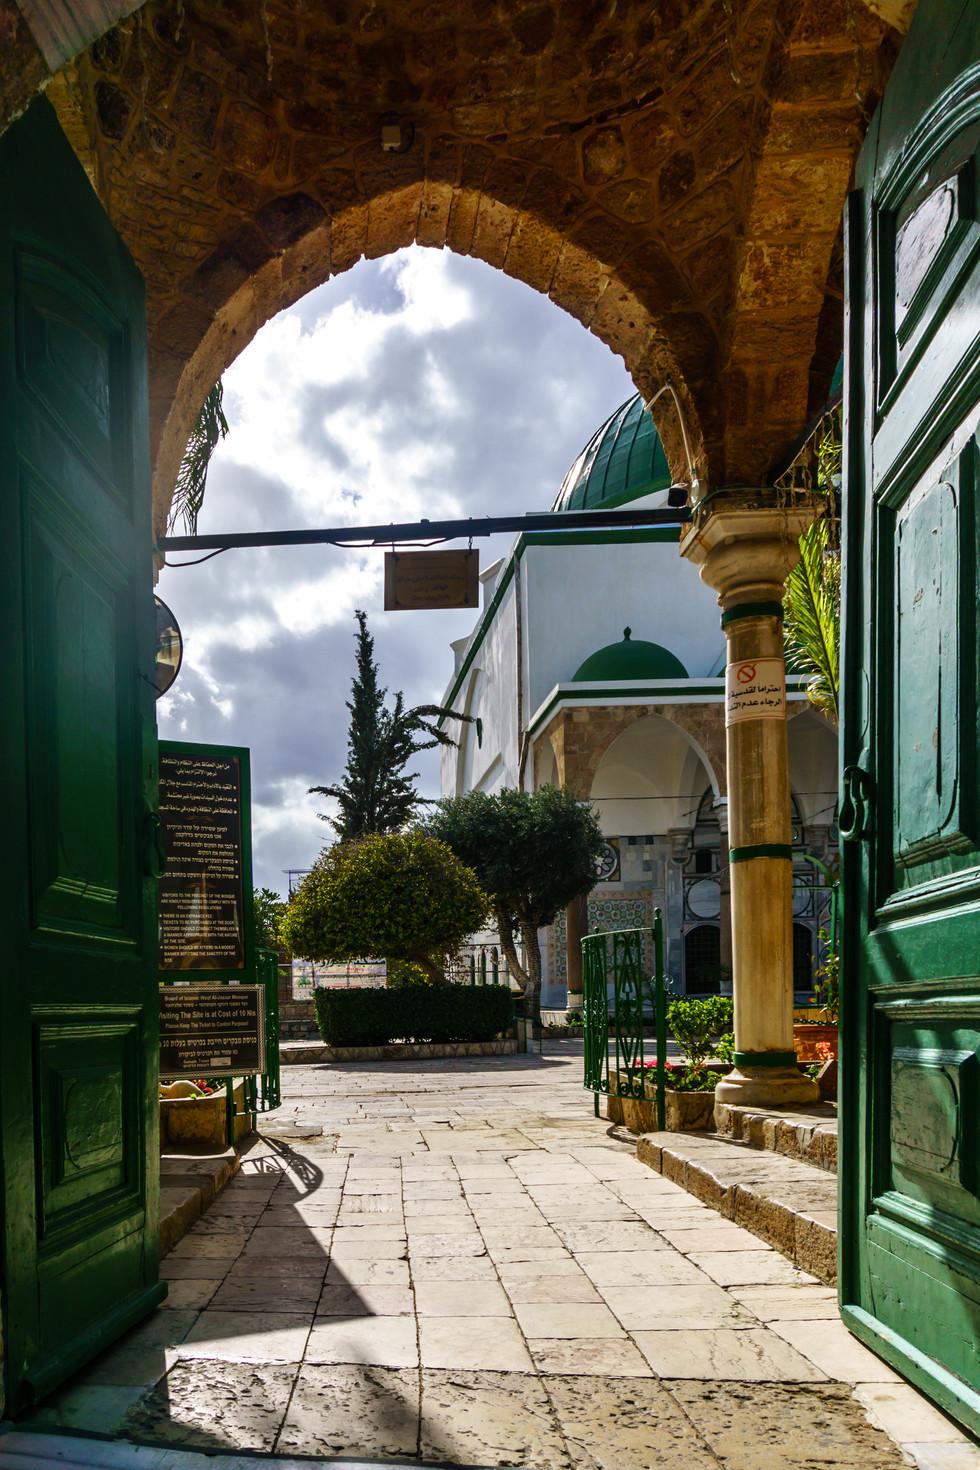 Mosque of el-Jazzar - Outer Entrance